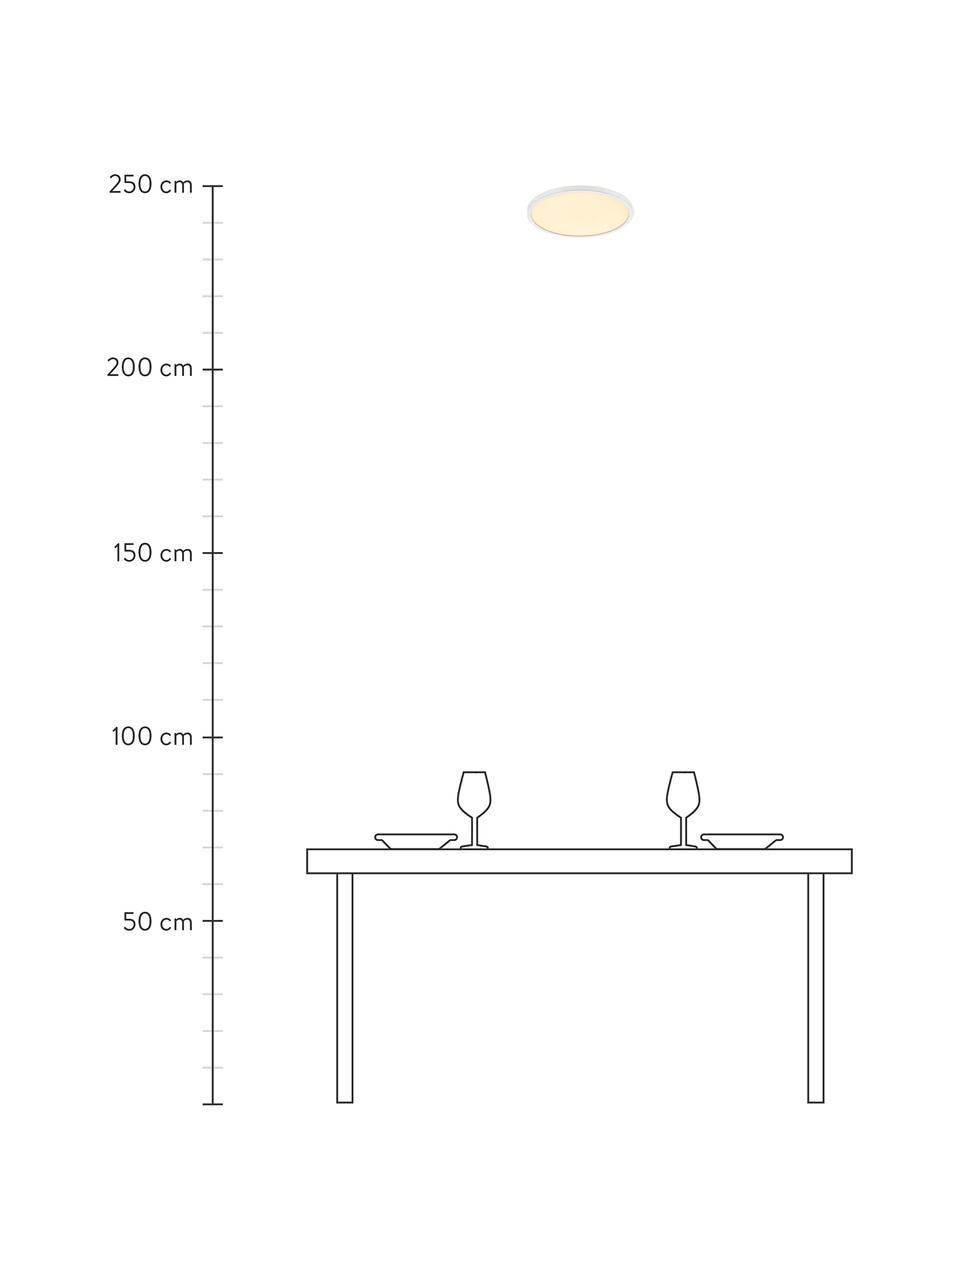 Kleines Dimmbares LED-Panel Oja, Lampenschirm: Kunststoff, Diffusorscheibe: Kunststoff, Weiß, Ø 29 x H 2 cm